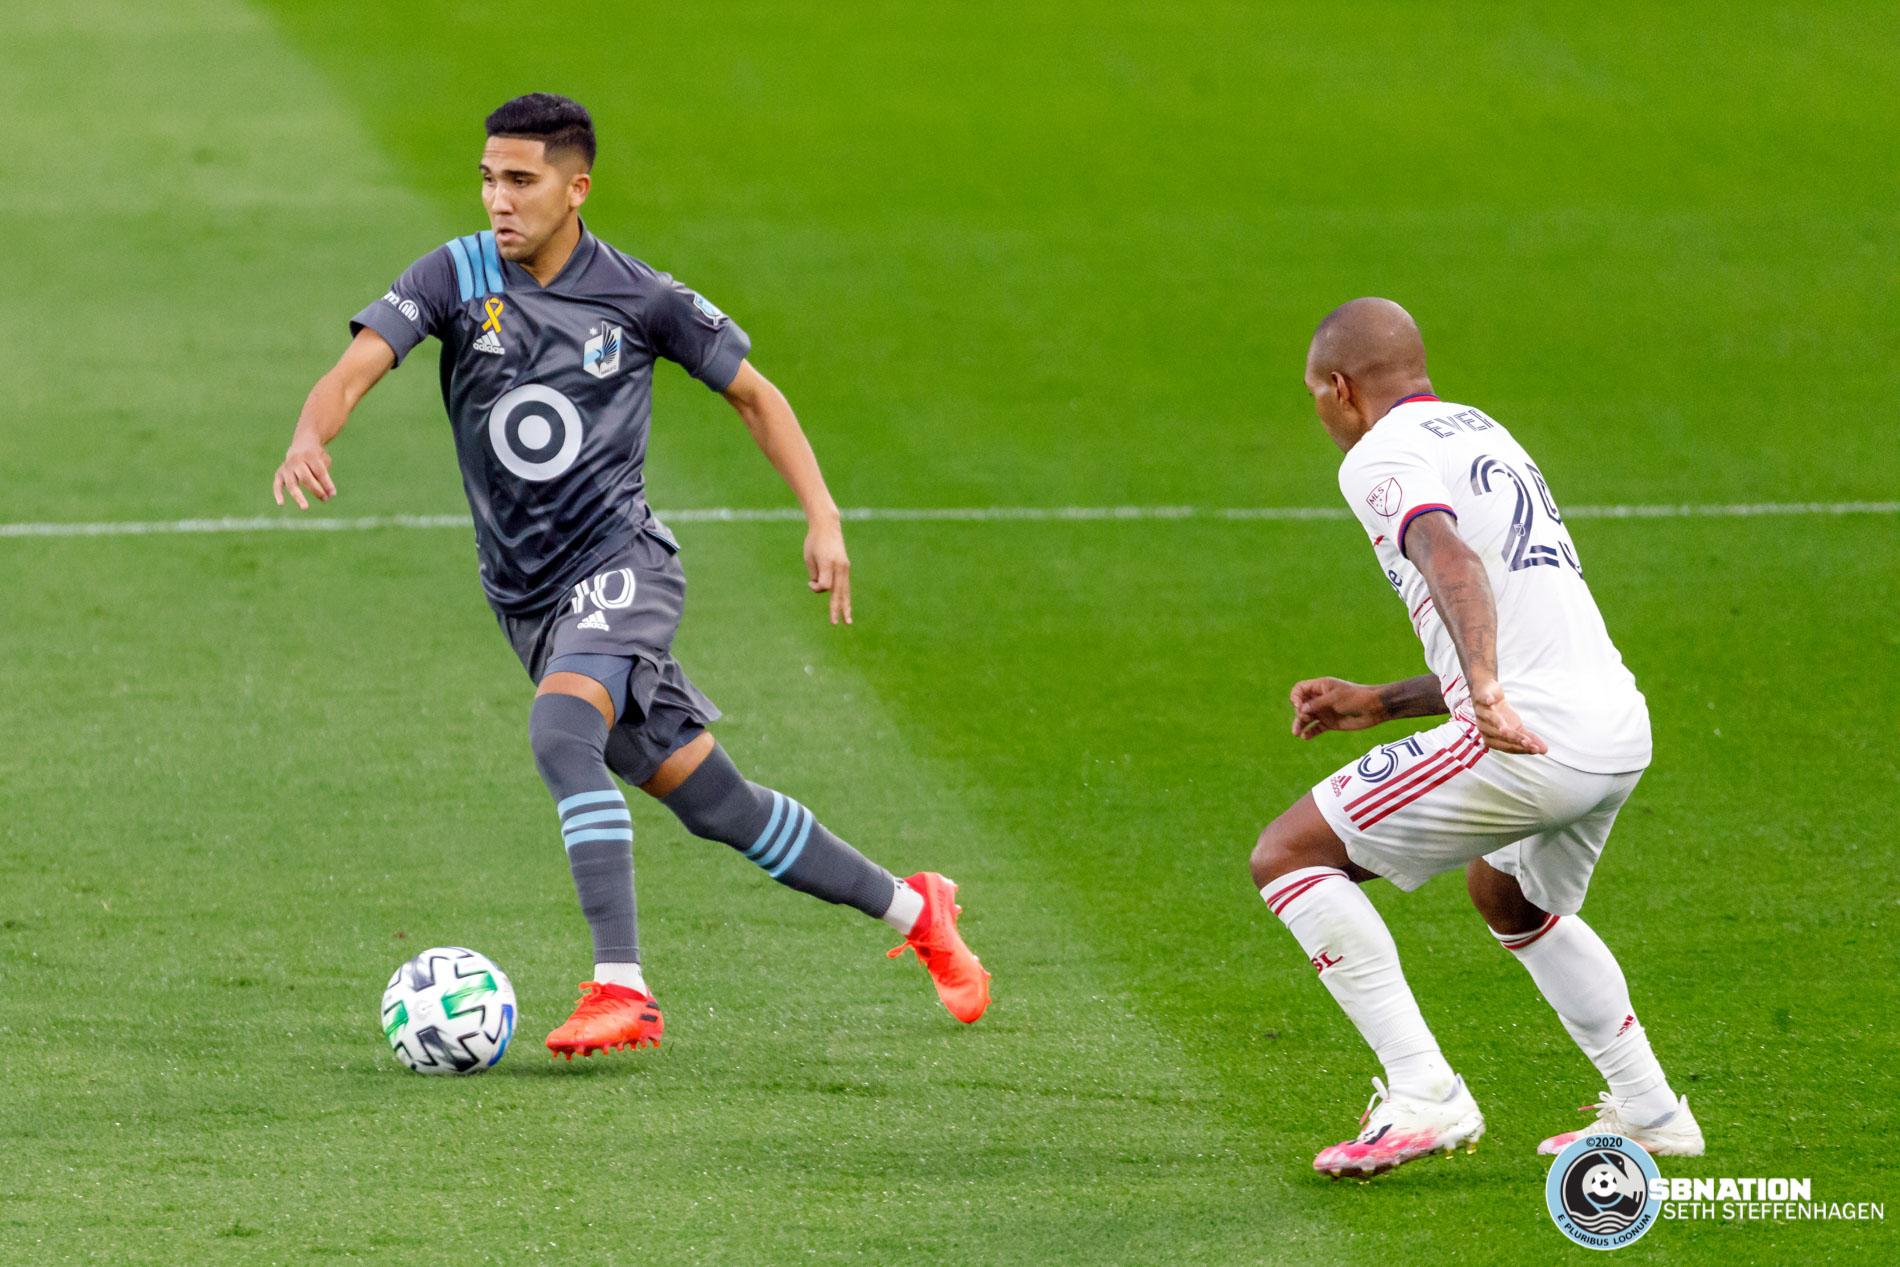 September 6, 2020 - Saint Paul, Minnesota, United States - Minnesota United midfielder Emanuel Reynoso (10) dribbles the ball during the match against Real Salt Lake at Allianz Field.